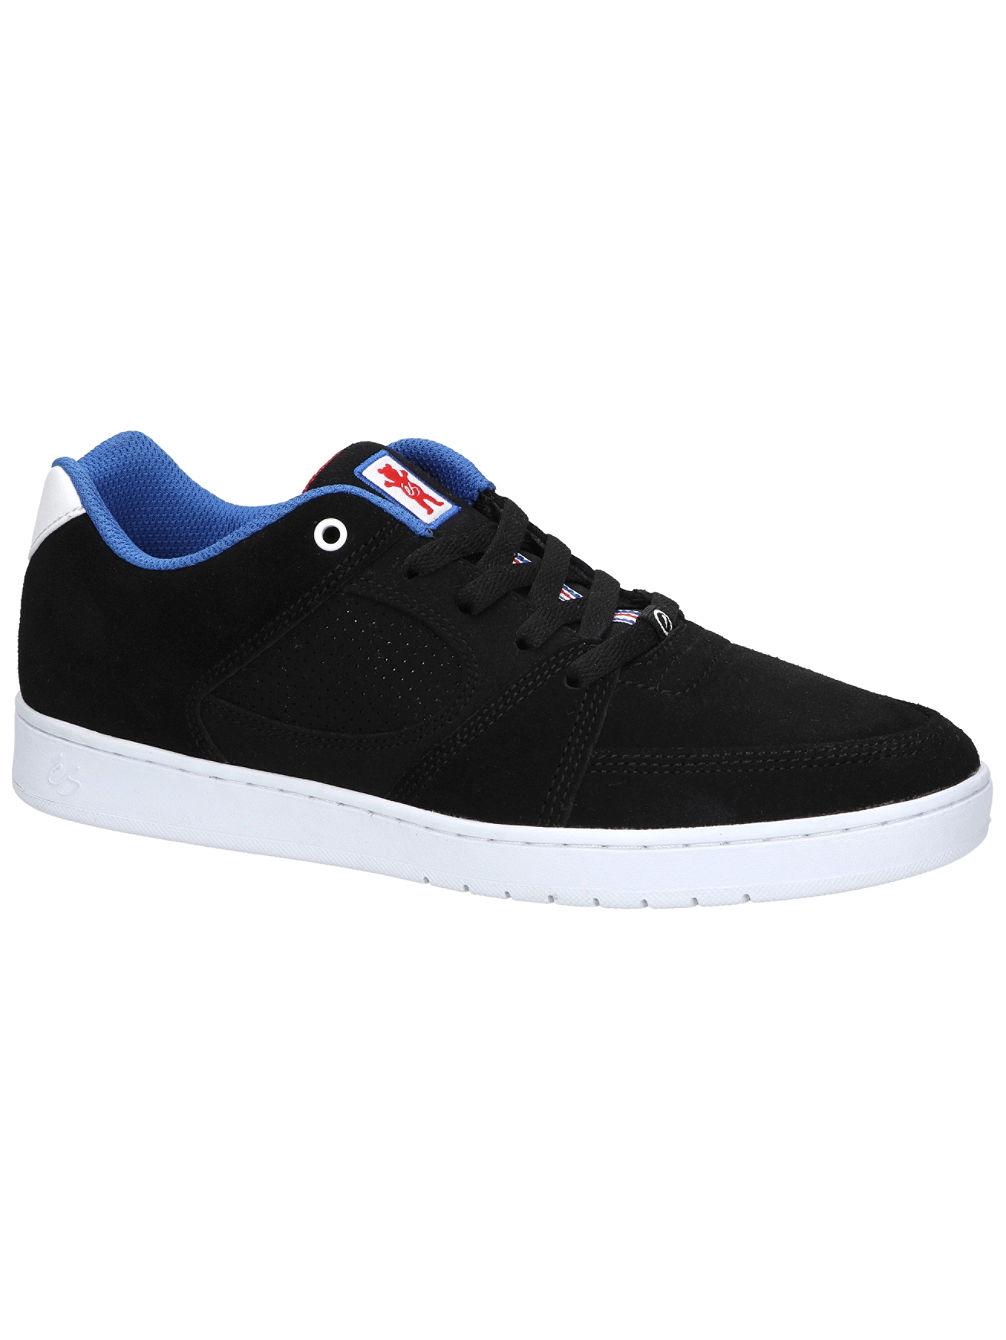 Skate Shoes Uk Size